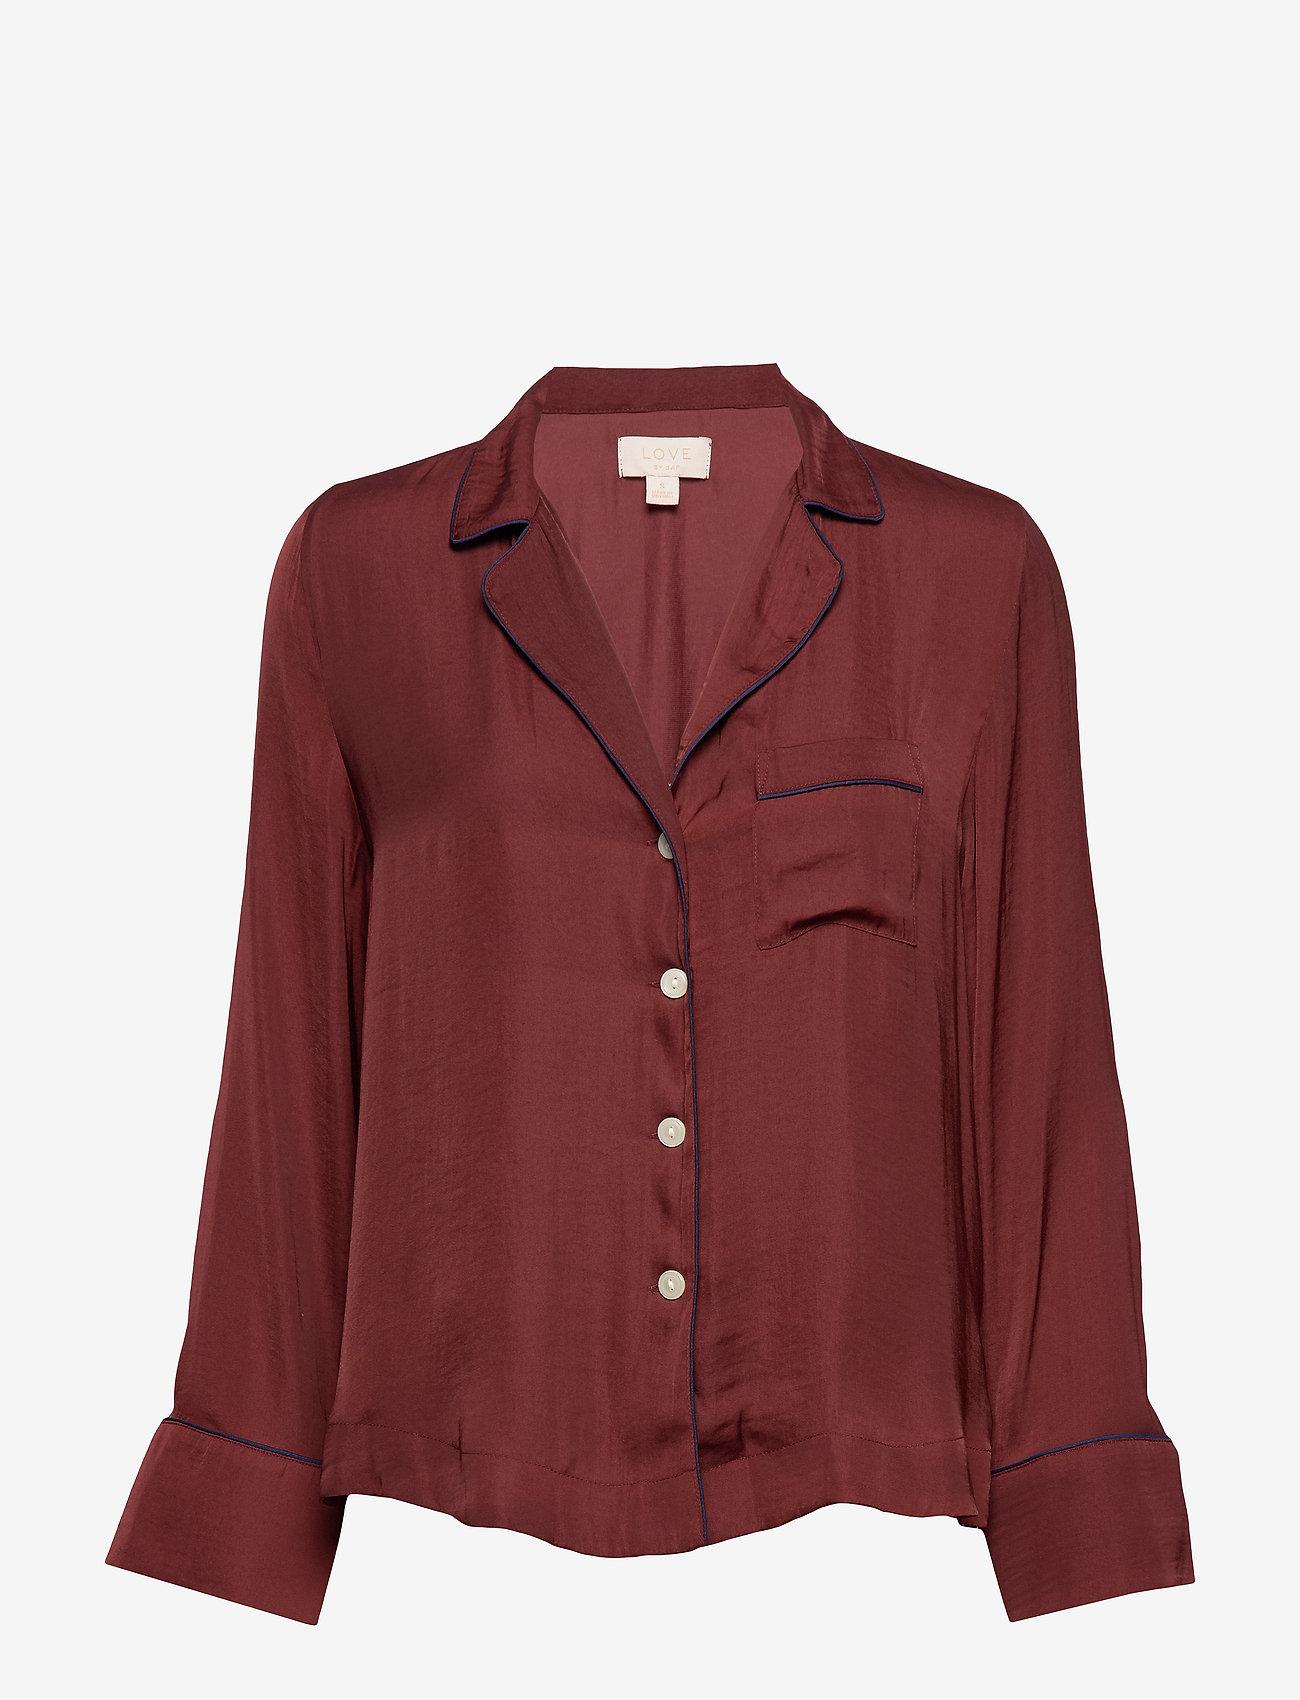 GAP Dreamwell Satin Shirt- Pyjamas et nuisettes SkkcWnvB M1nnX 5BjddMns